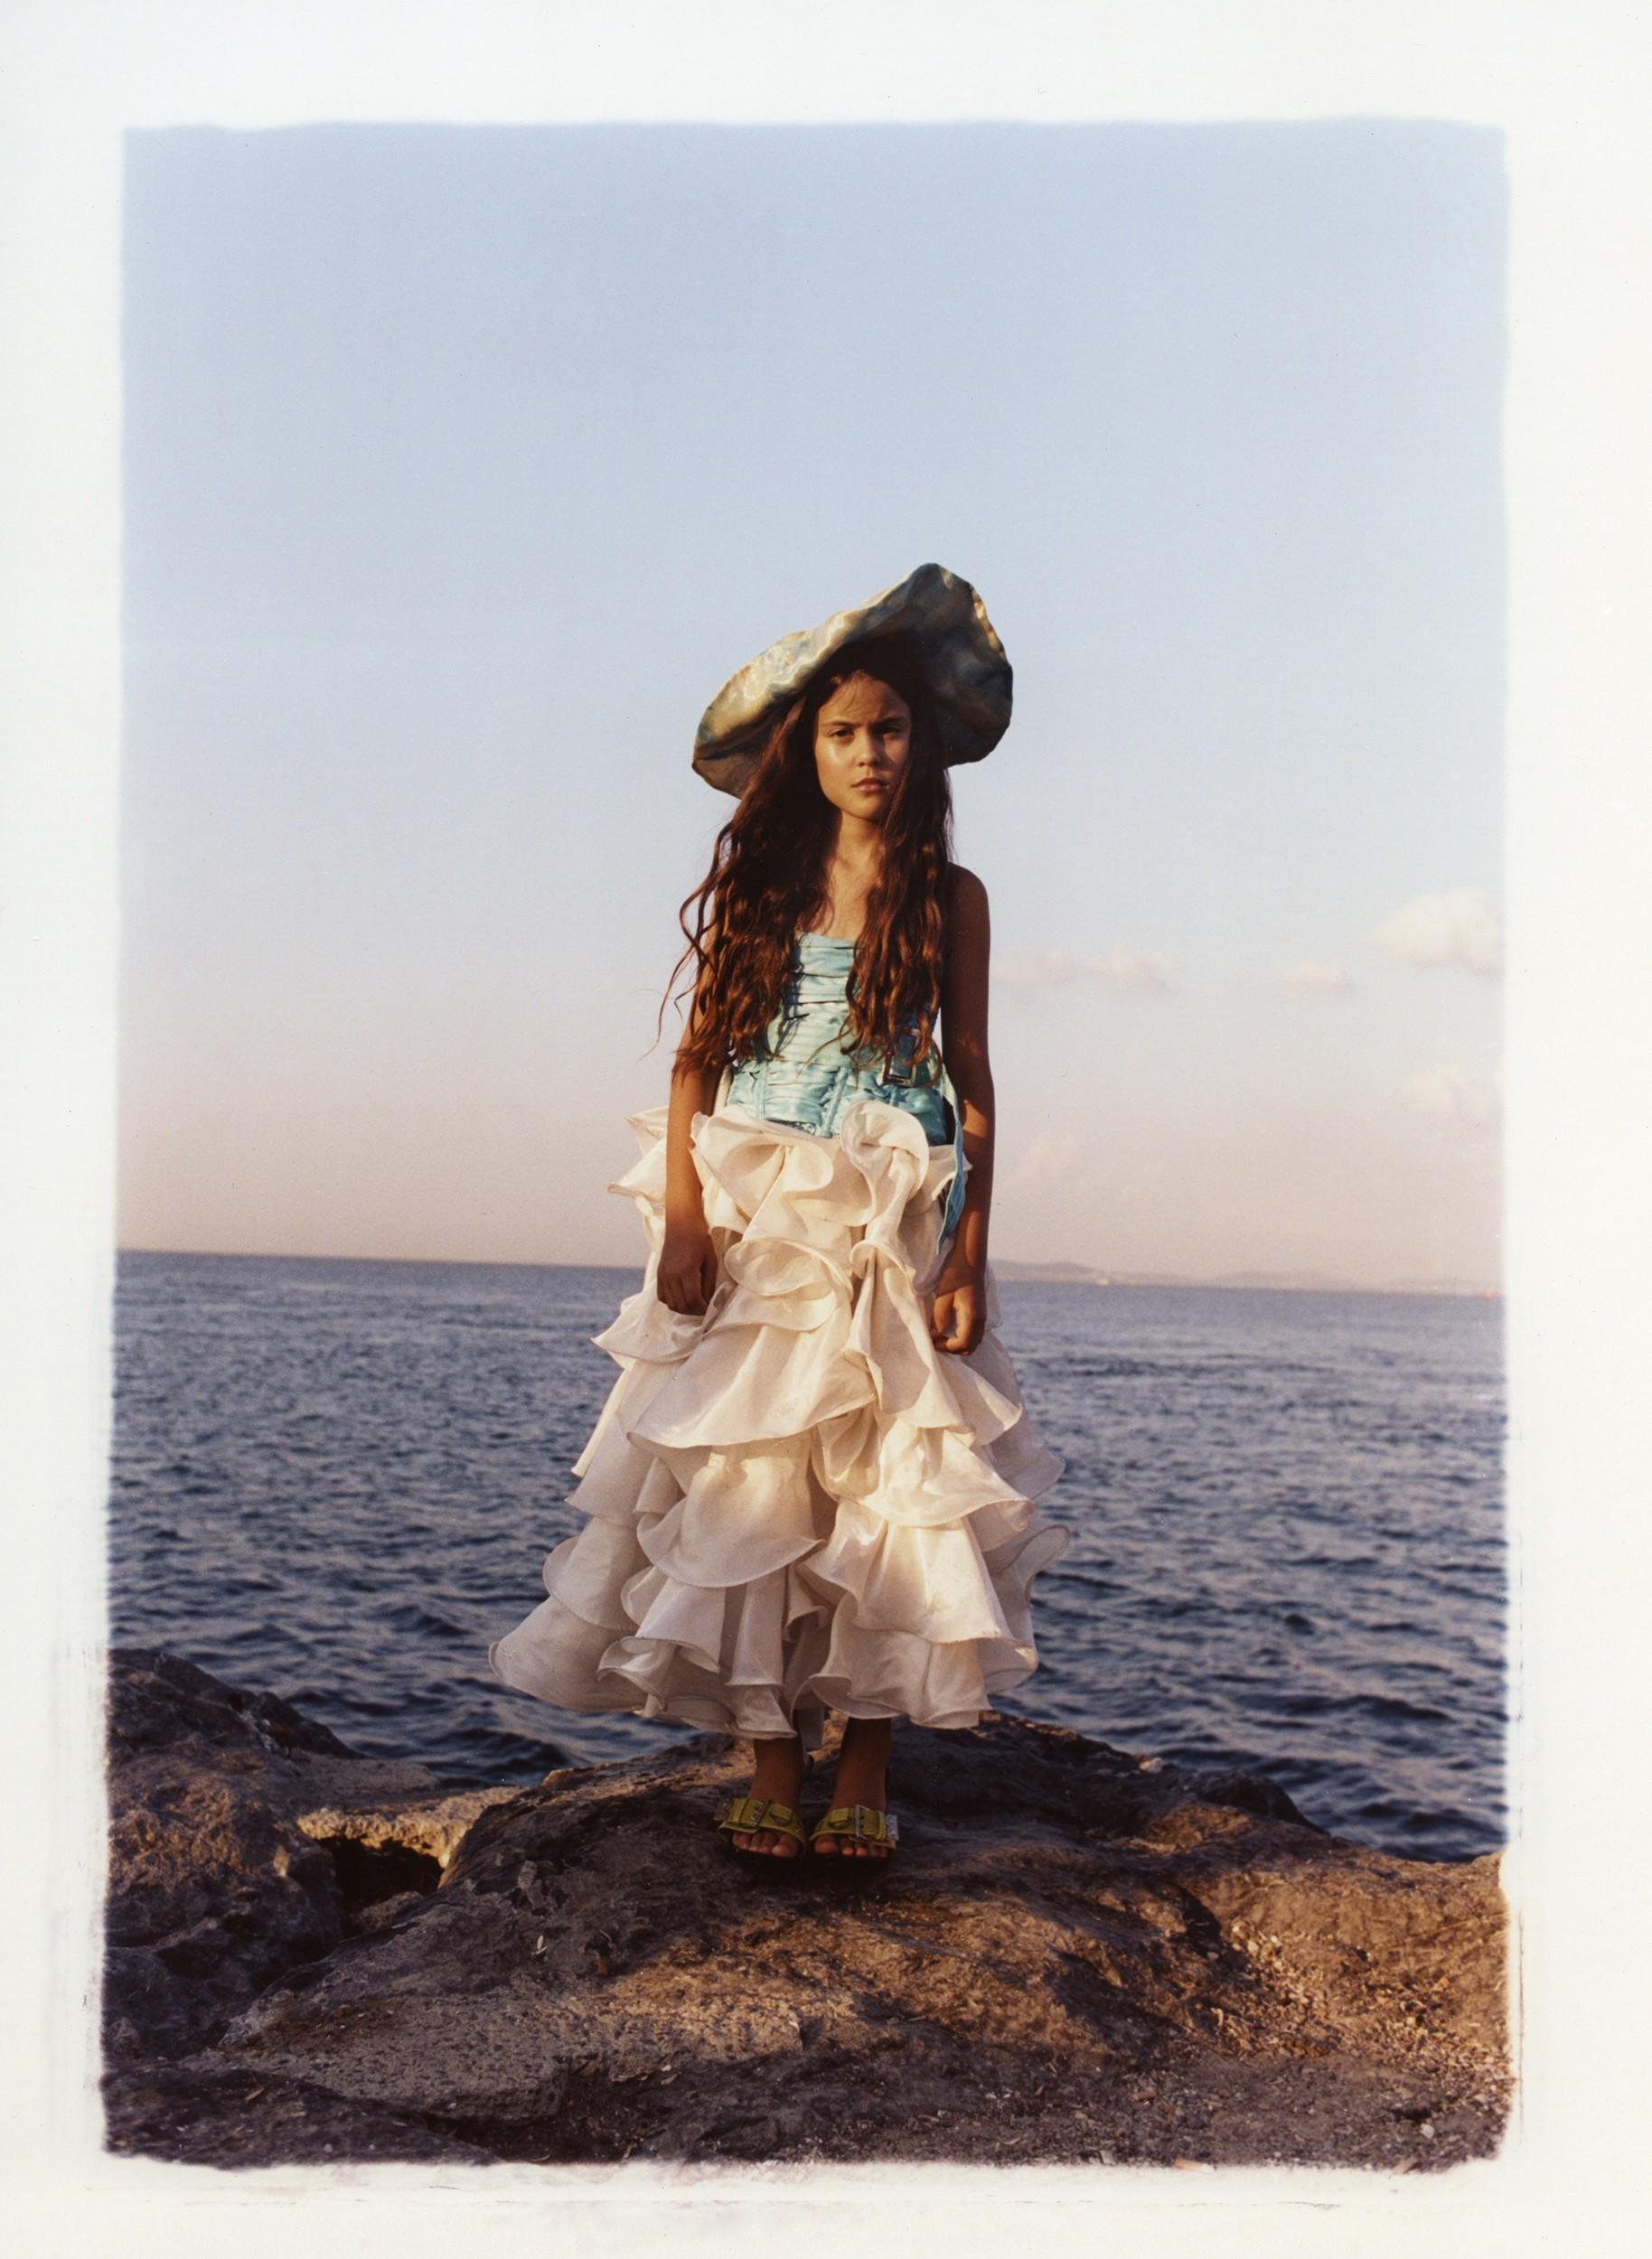 IGNANT-Photography-Sam-Nixon-09